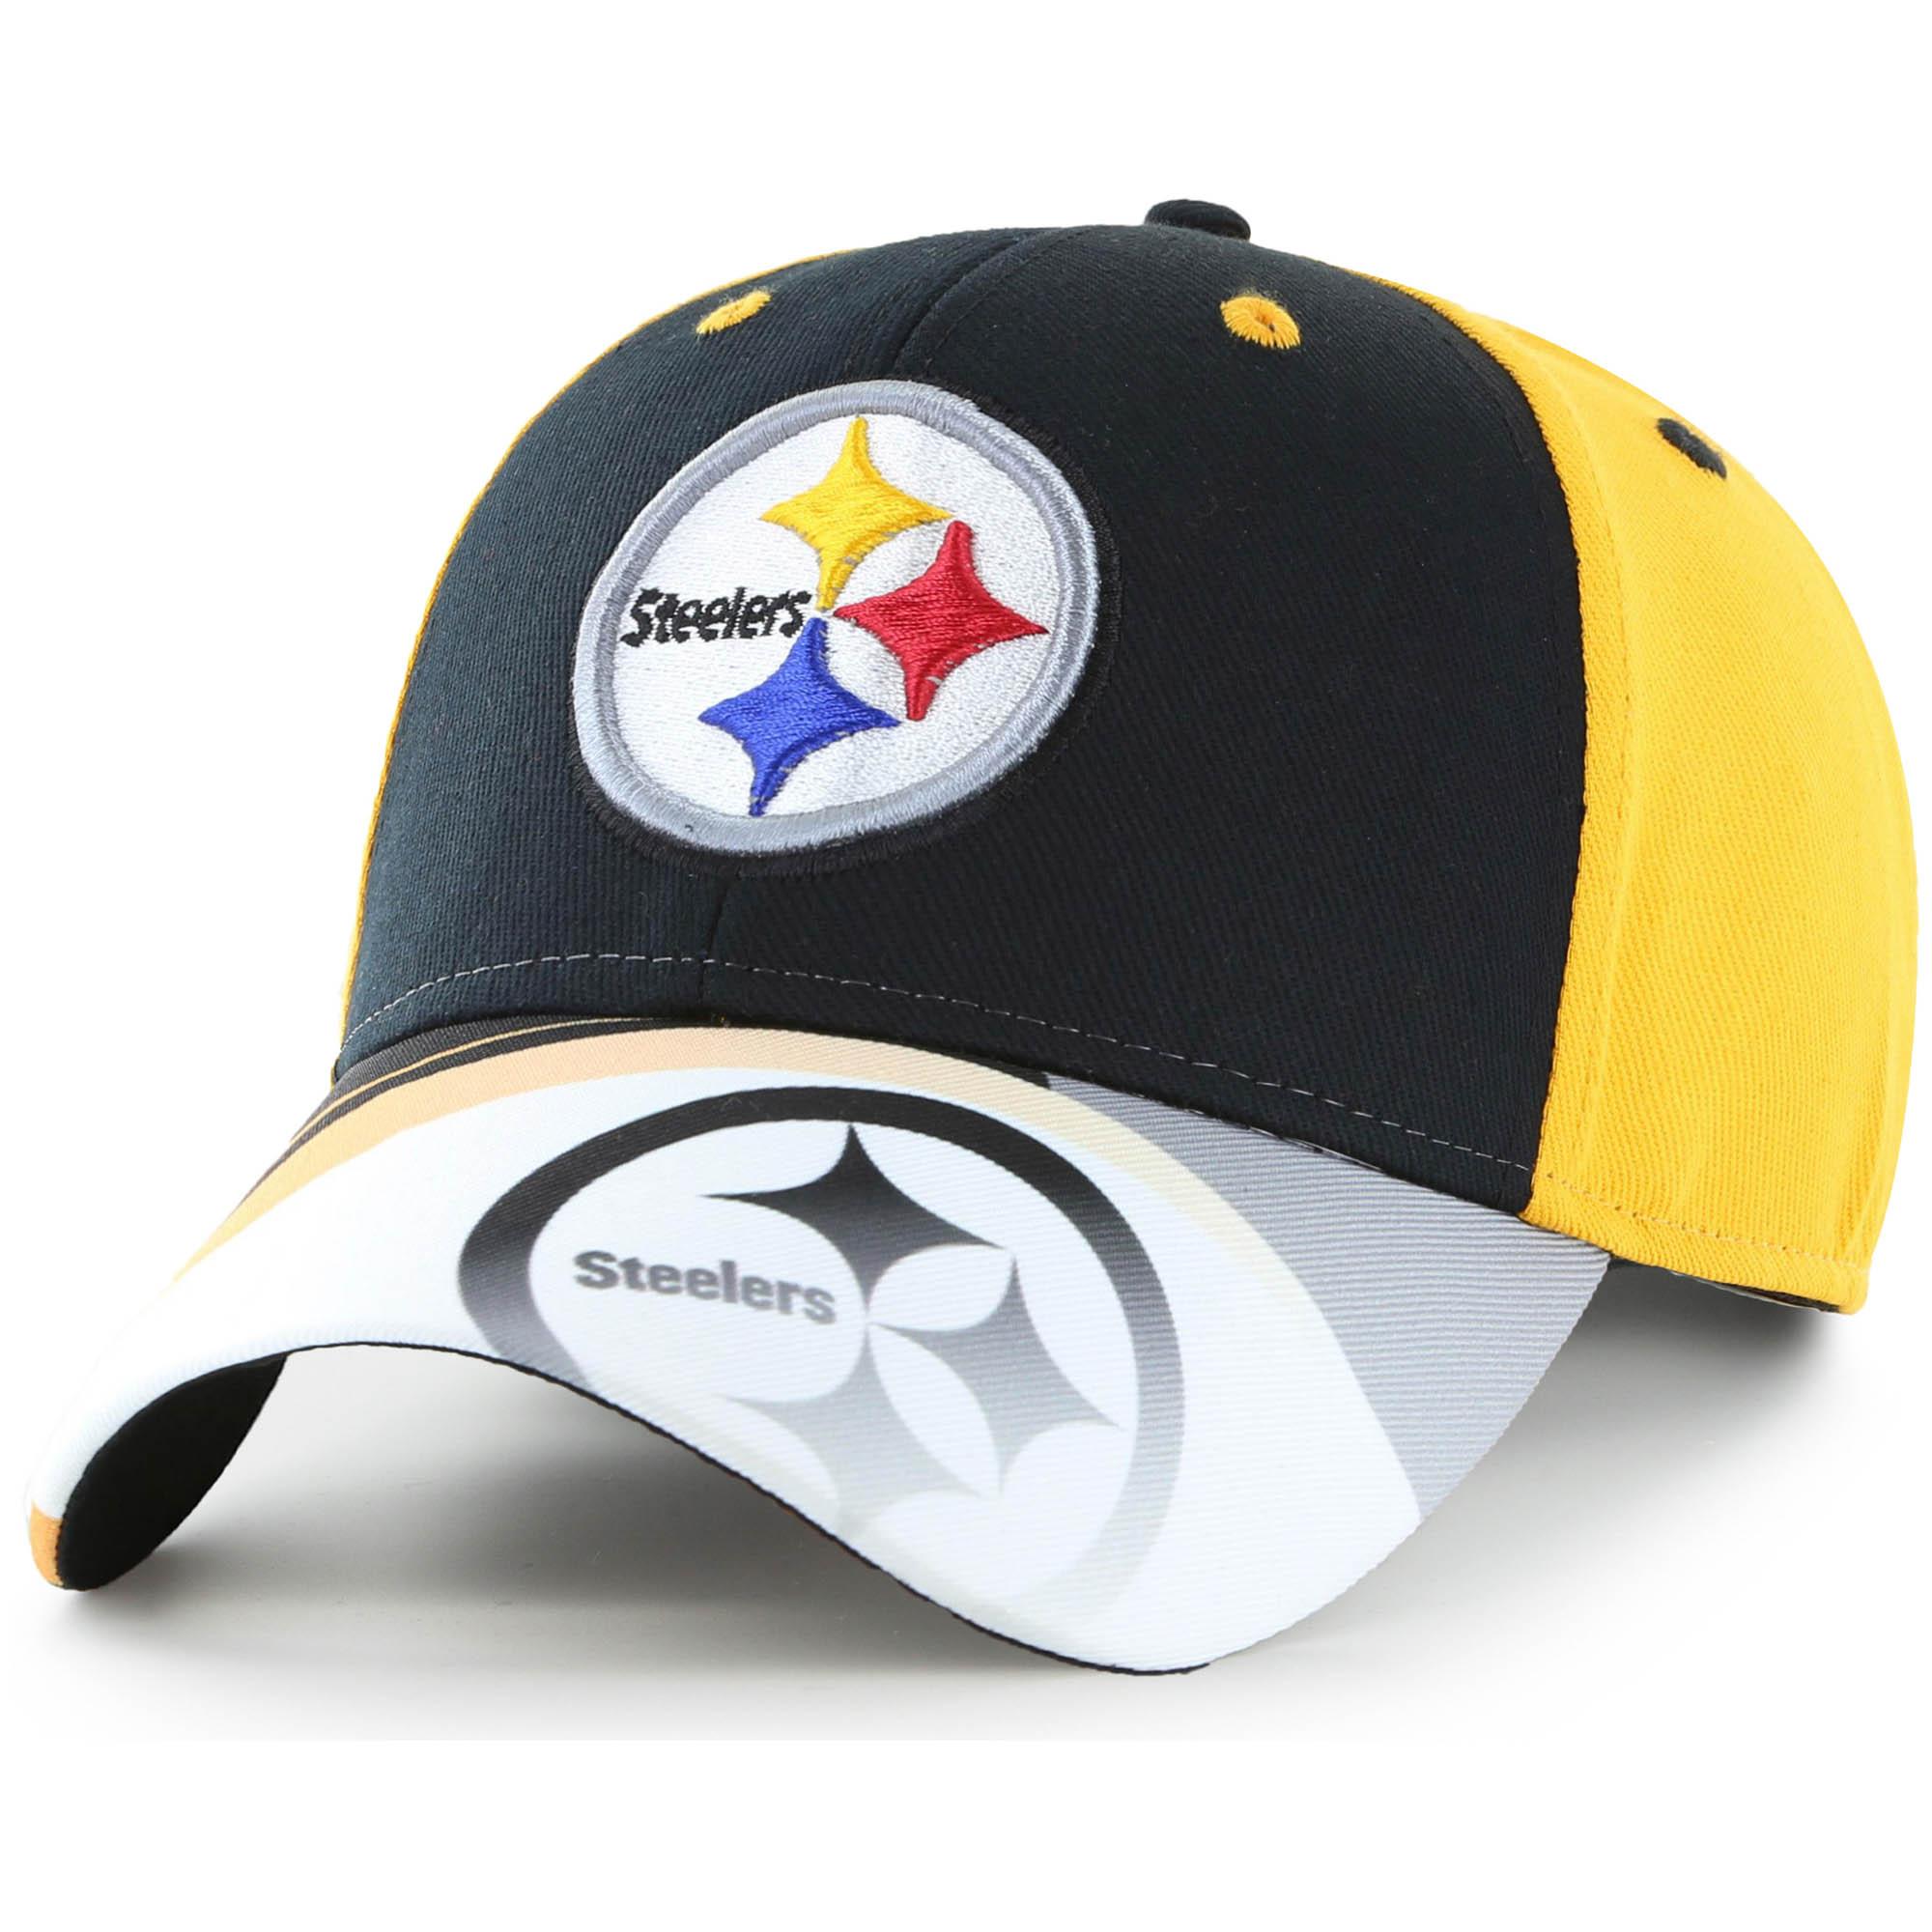 Men's Fan Favorite Black/Gold Pittsburgh Steelers Squib Kick Adjustable Hat - OSFA